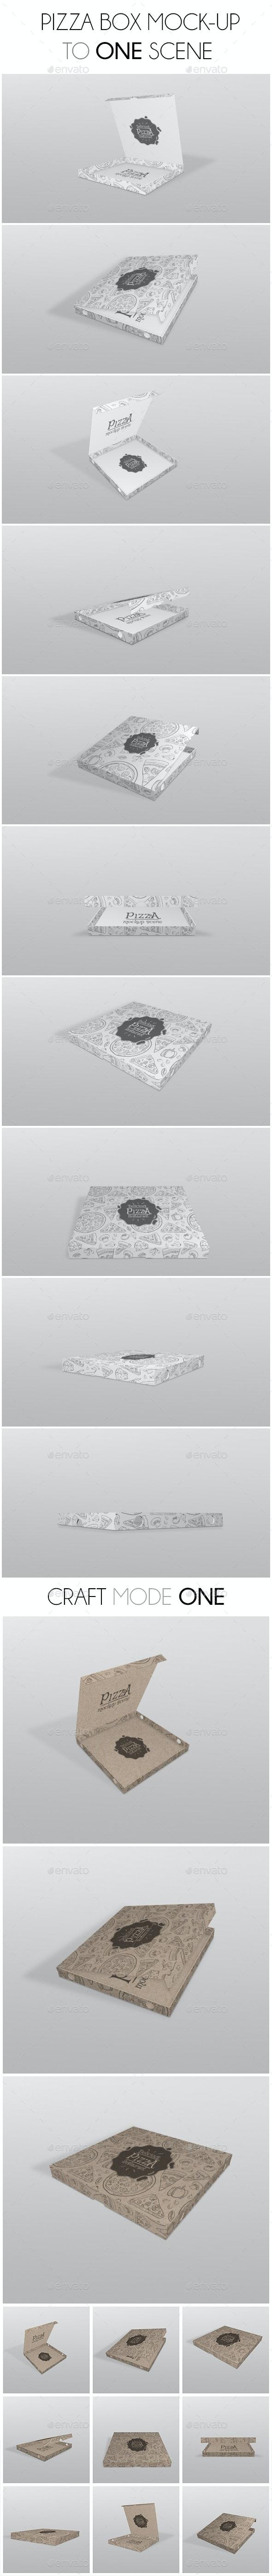 Pizza Box Mockup - Product Mock-Ups Graphics